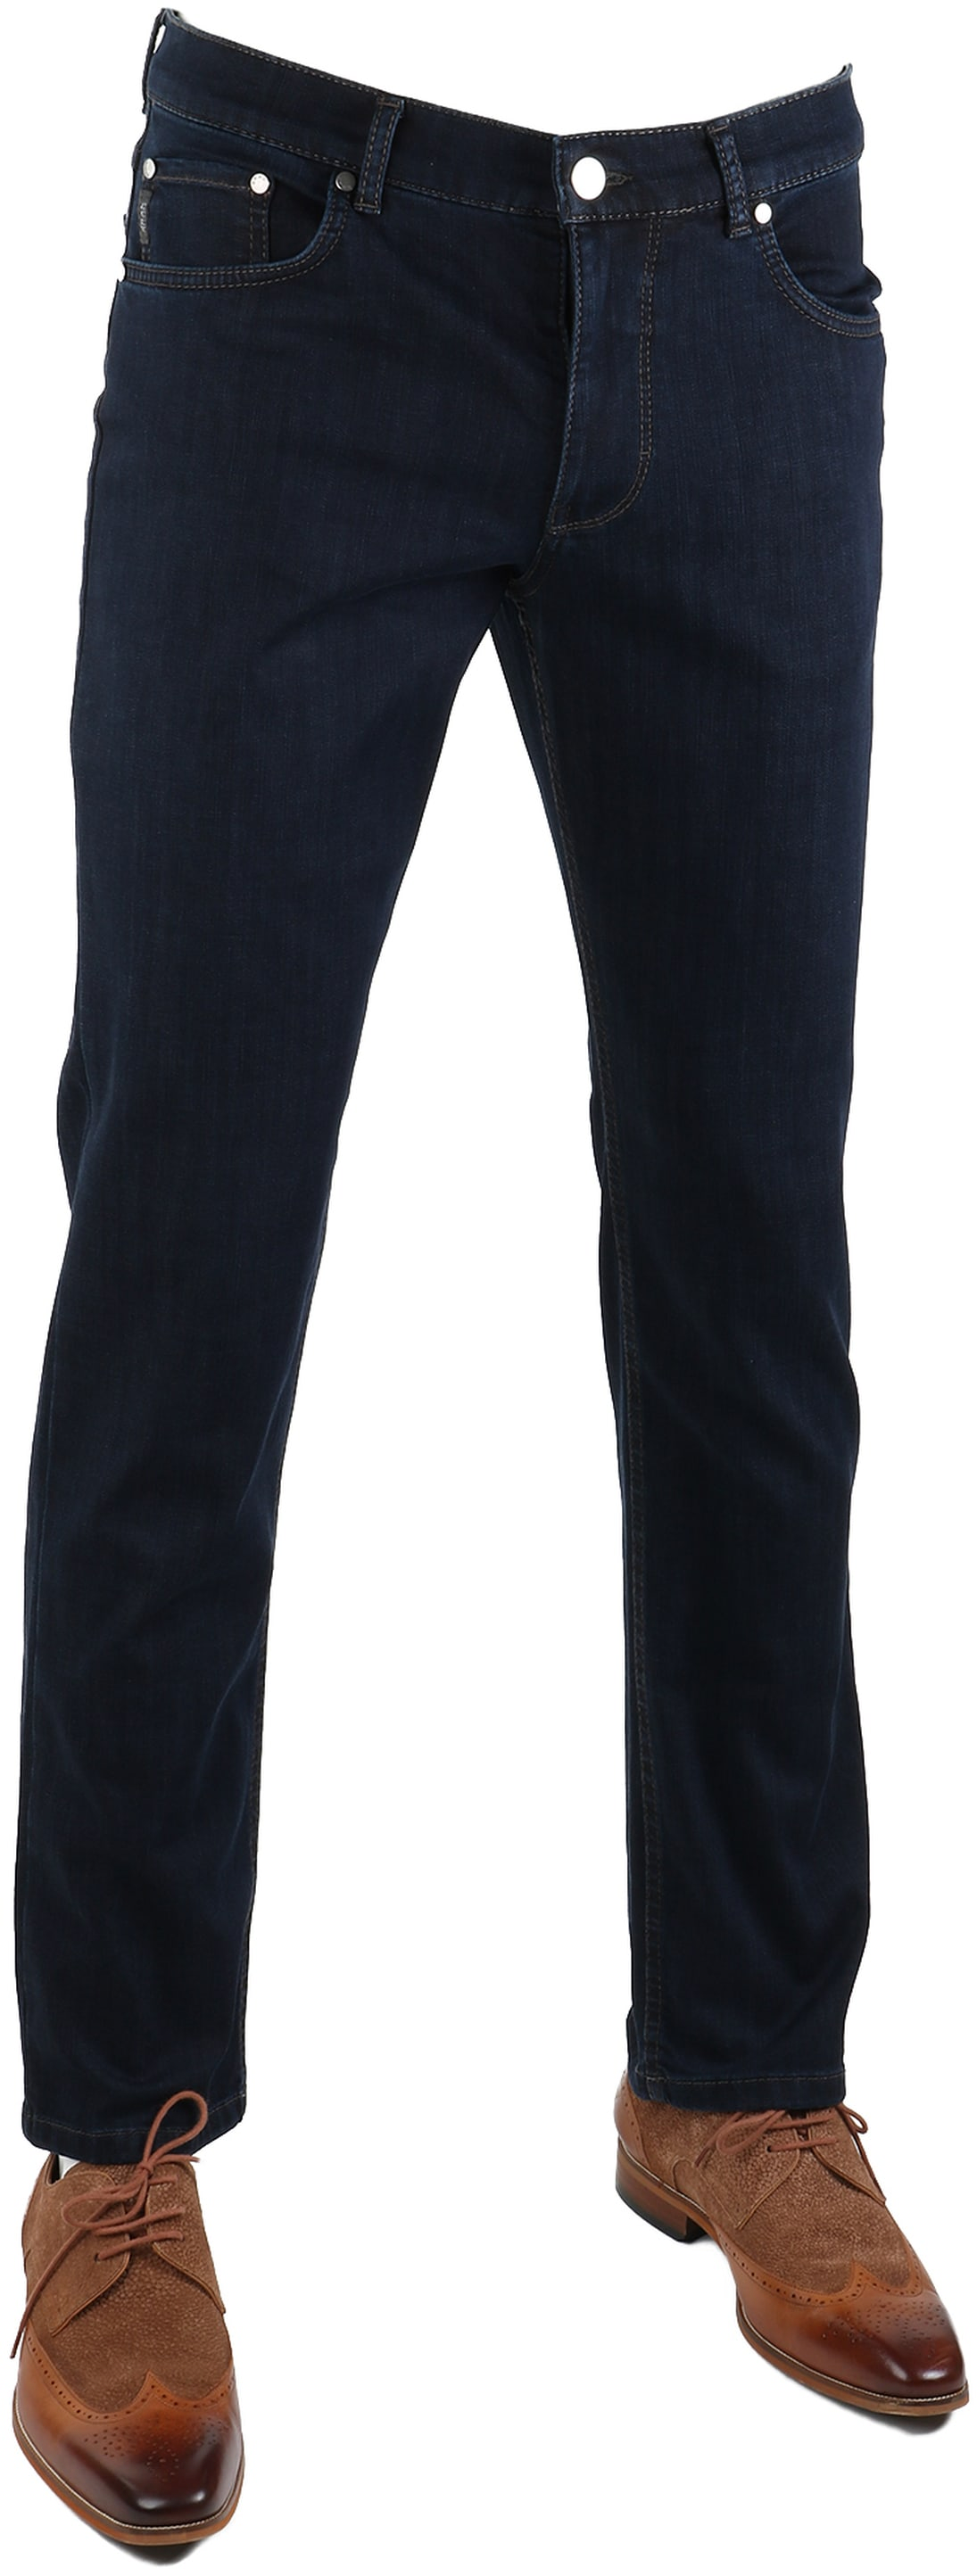 Brax Cooper Denim Jeans Dark Five Pocket foto 0